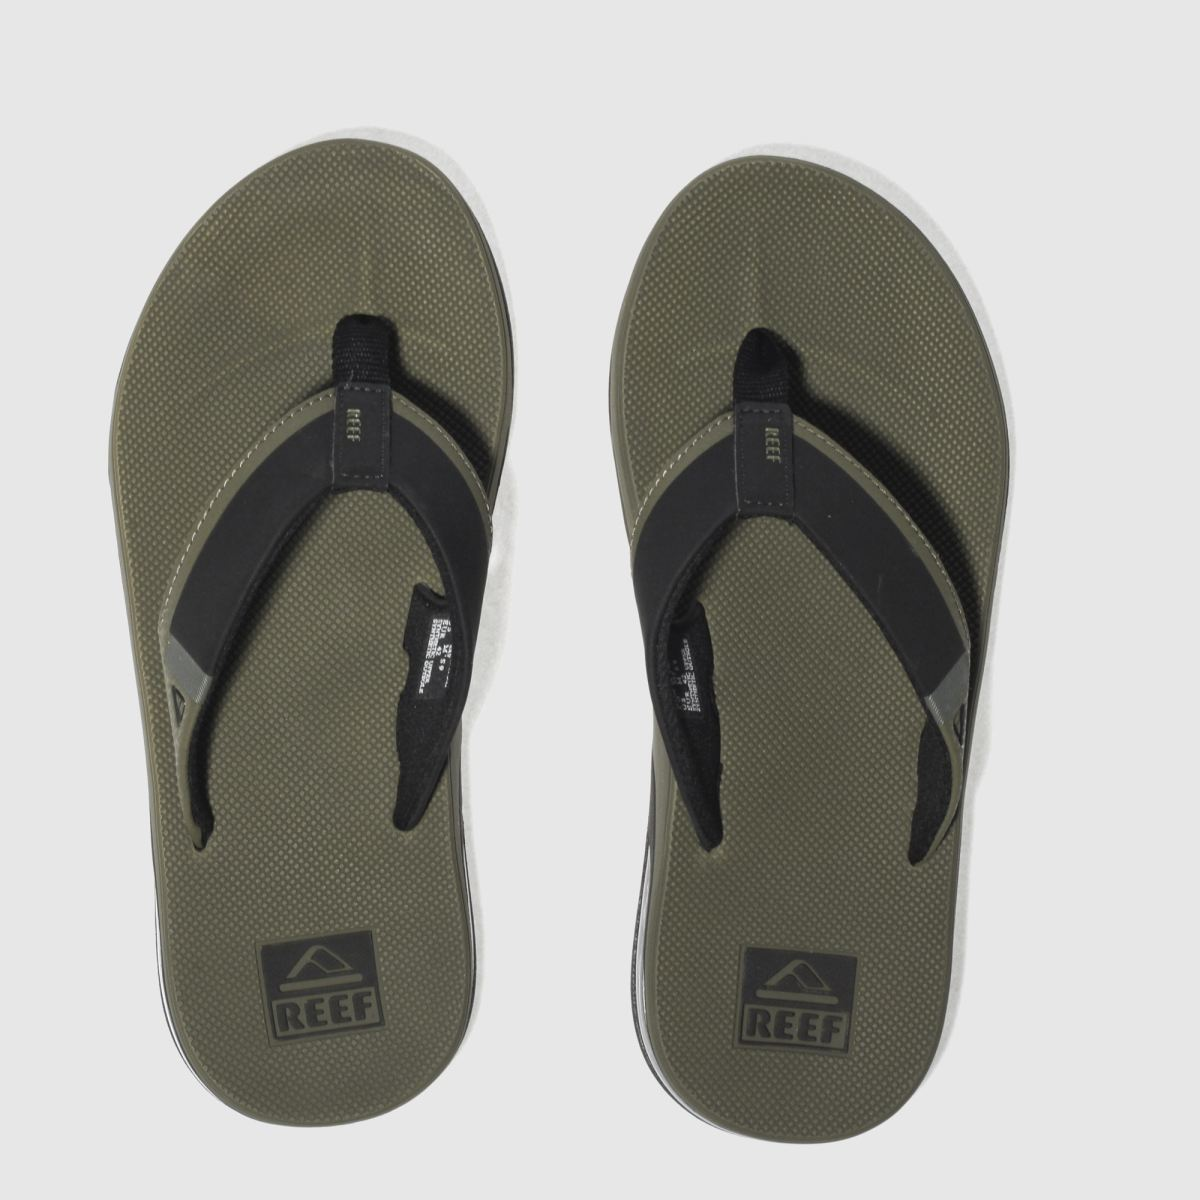 Reef Reef Khaki Fanning Low Sandals